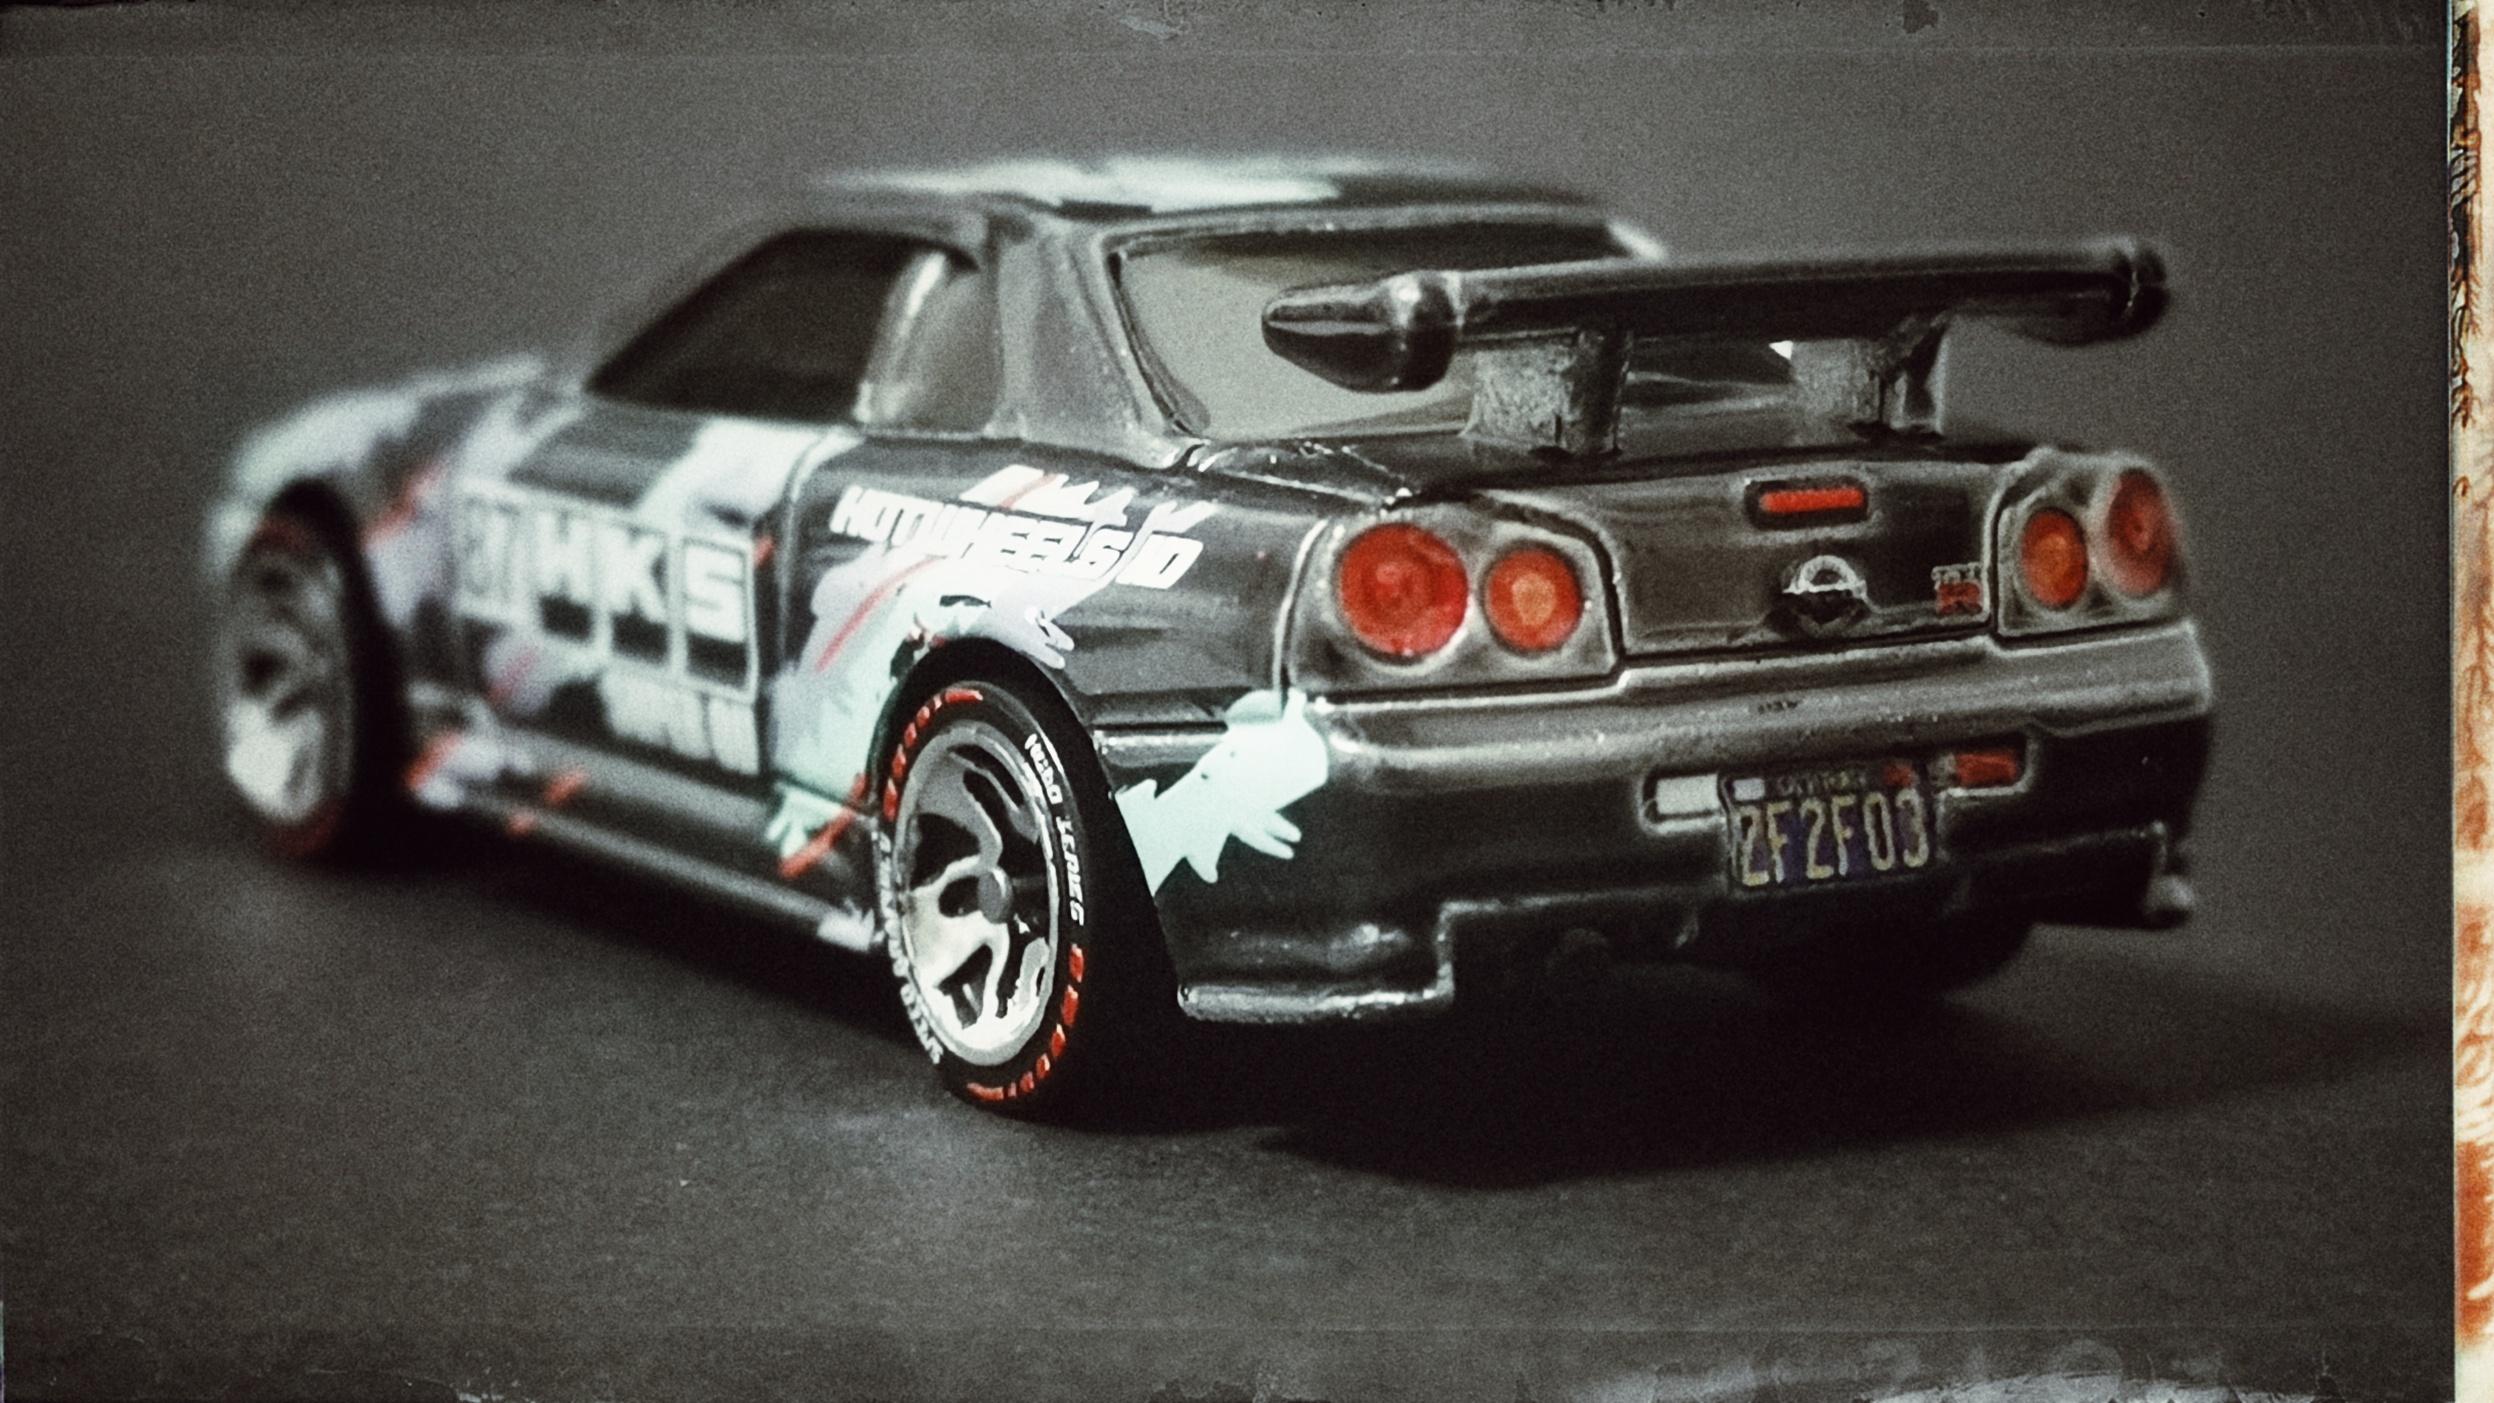 Hot Wheels id Nissan Skyline GT-R (R34) (HBG07) 2021 HW Speed Graphics (03/04) spectraflame black back angle